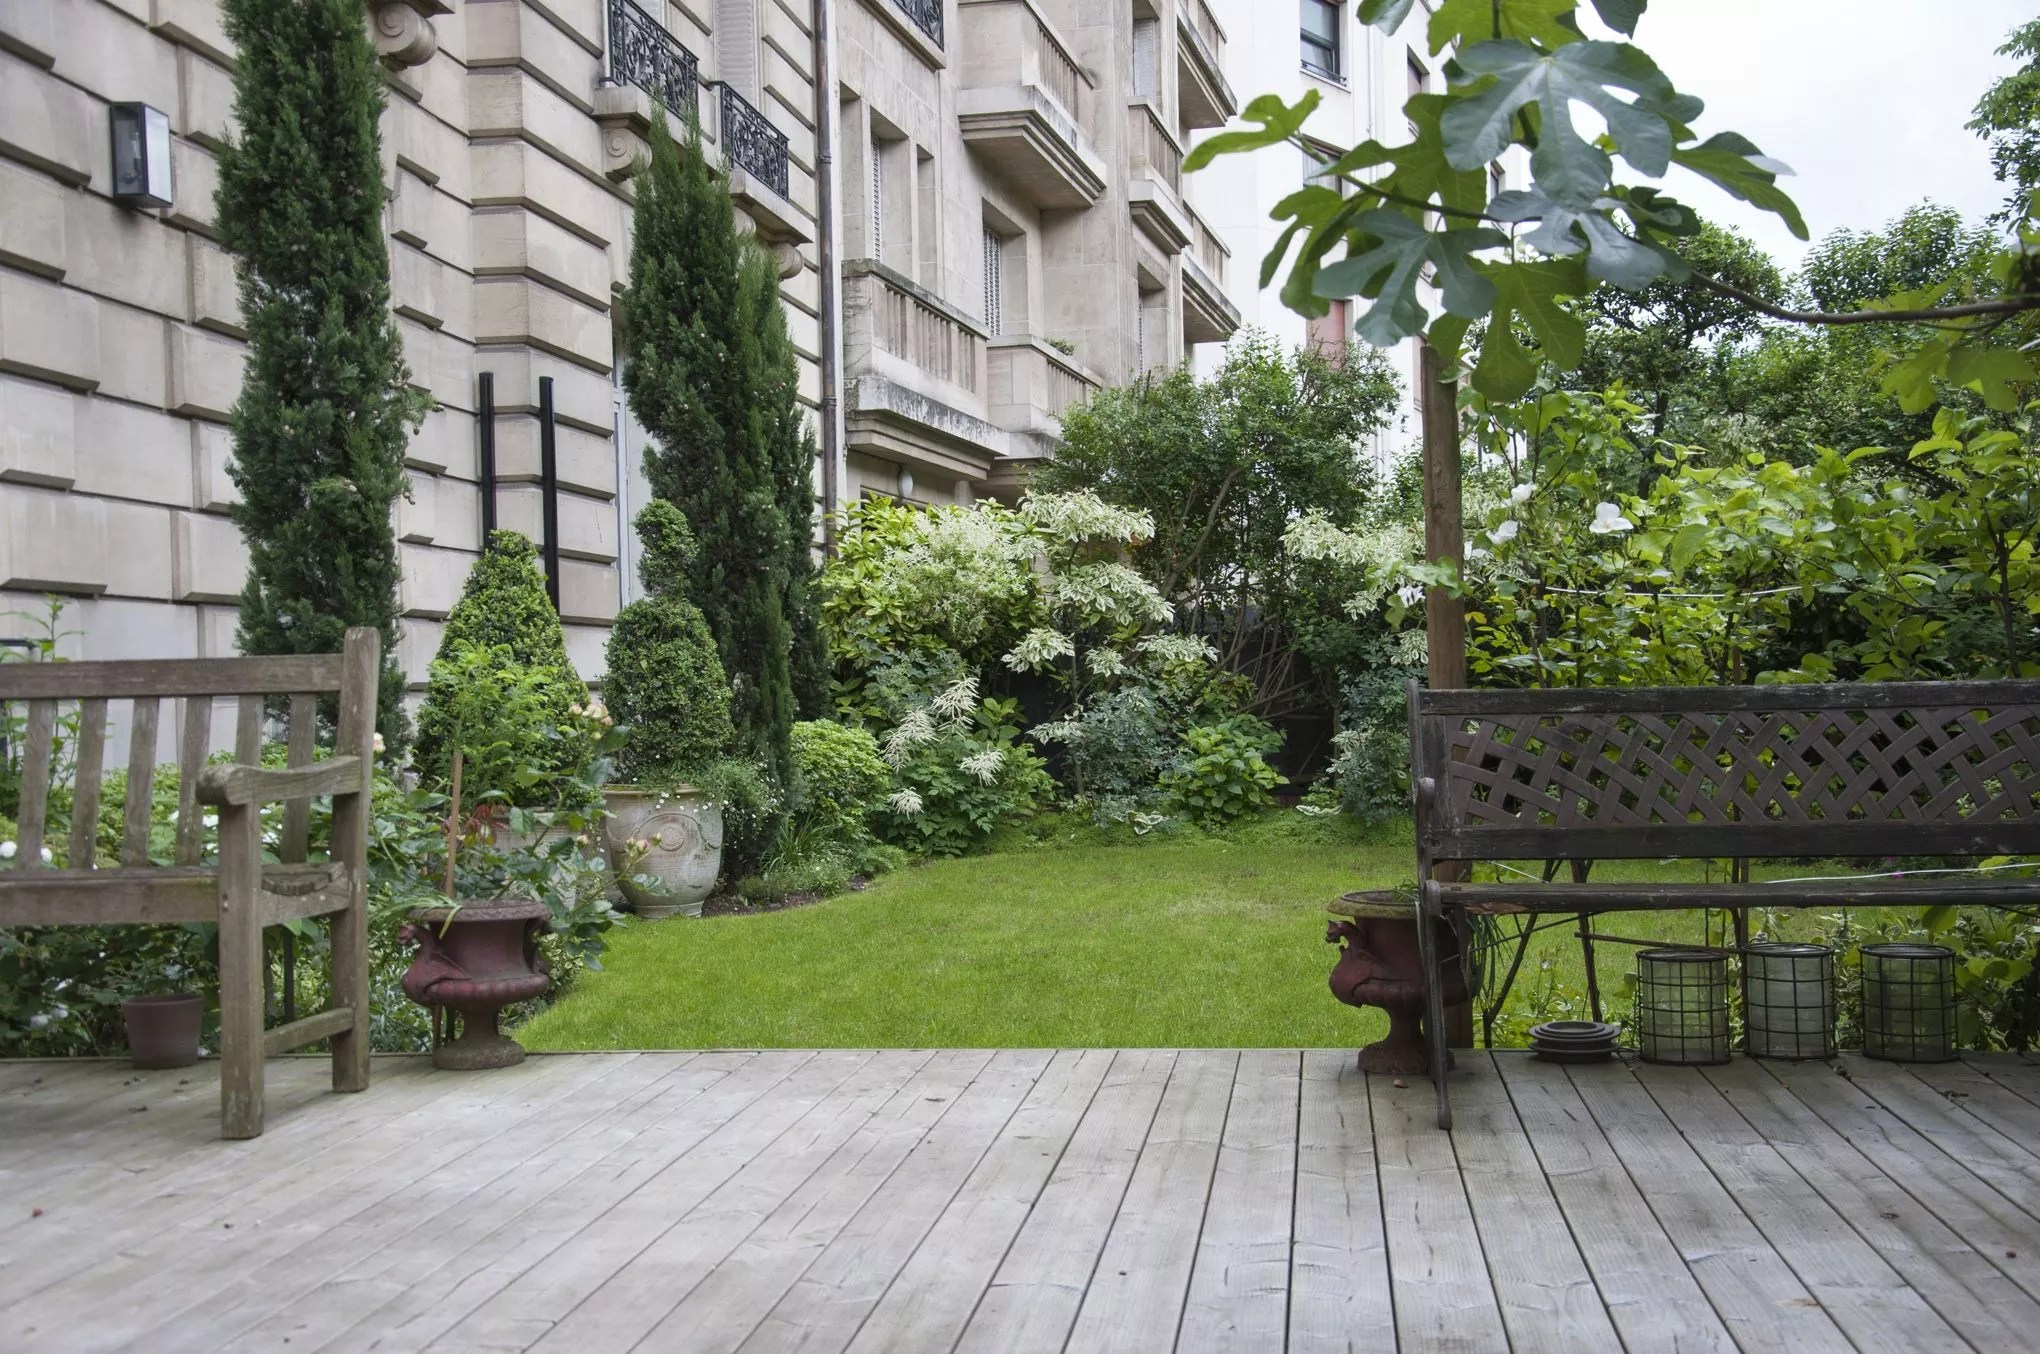 Idee Jardin Petite Surface | Mur Végétal Jardin Vertical Les ...